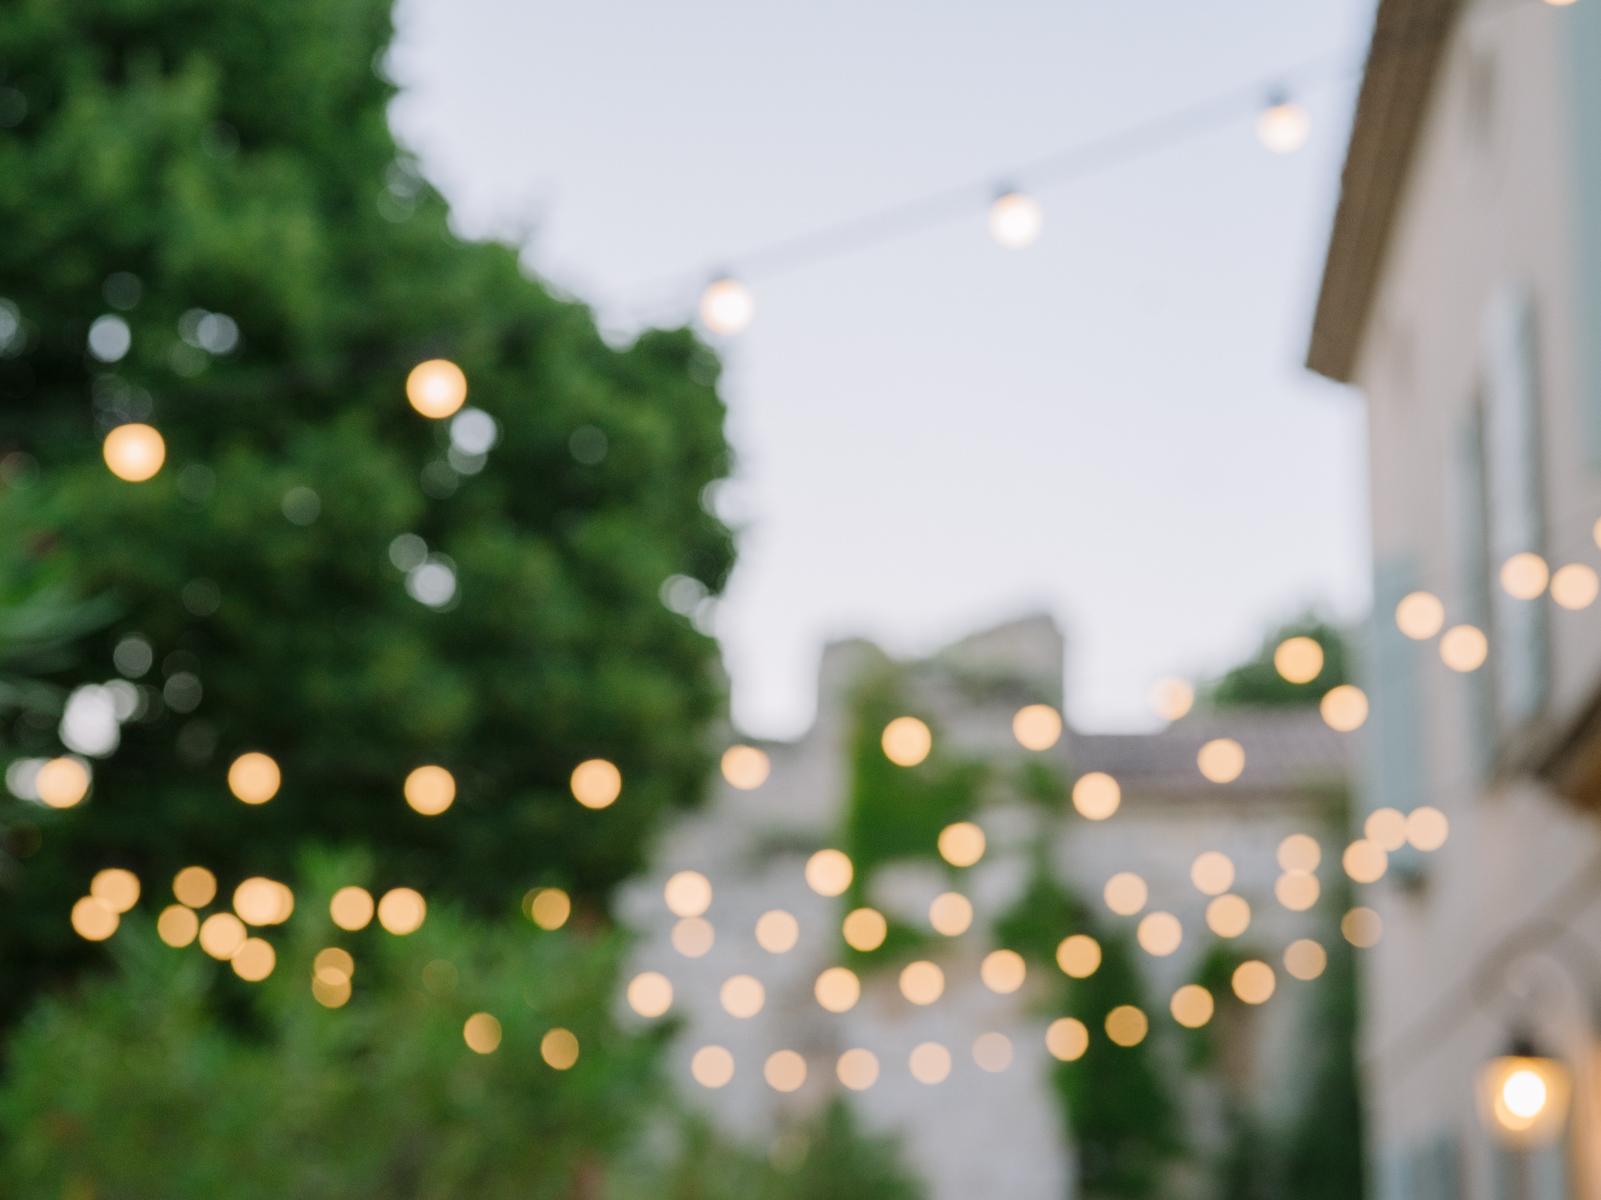 Boheme-Moon-Photography-Wedding-in-Provence-France_030-2.jpg